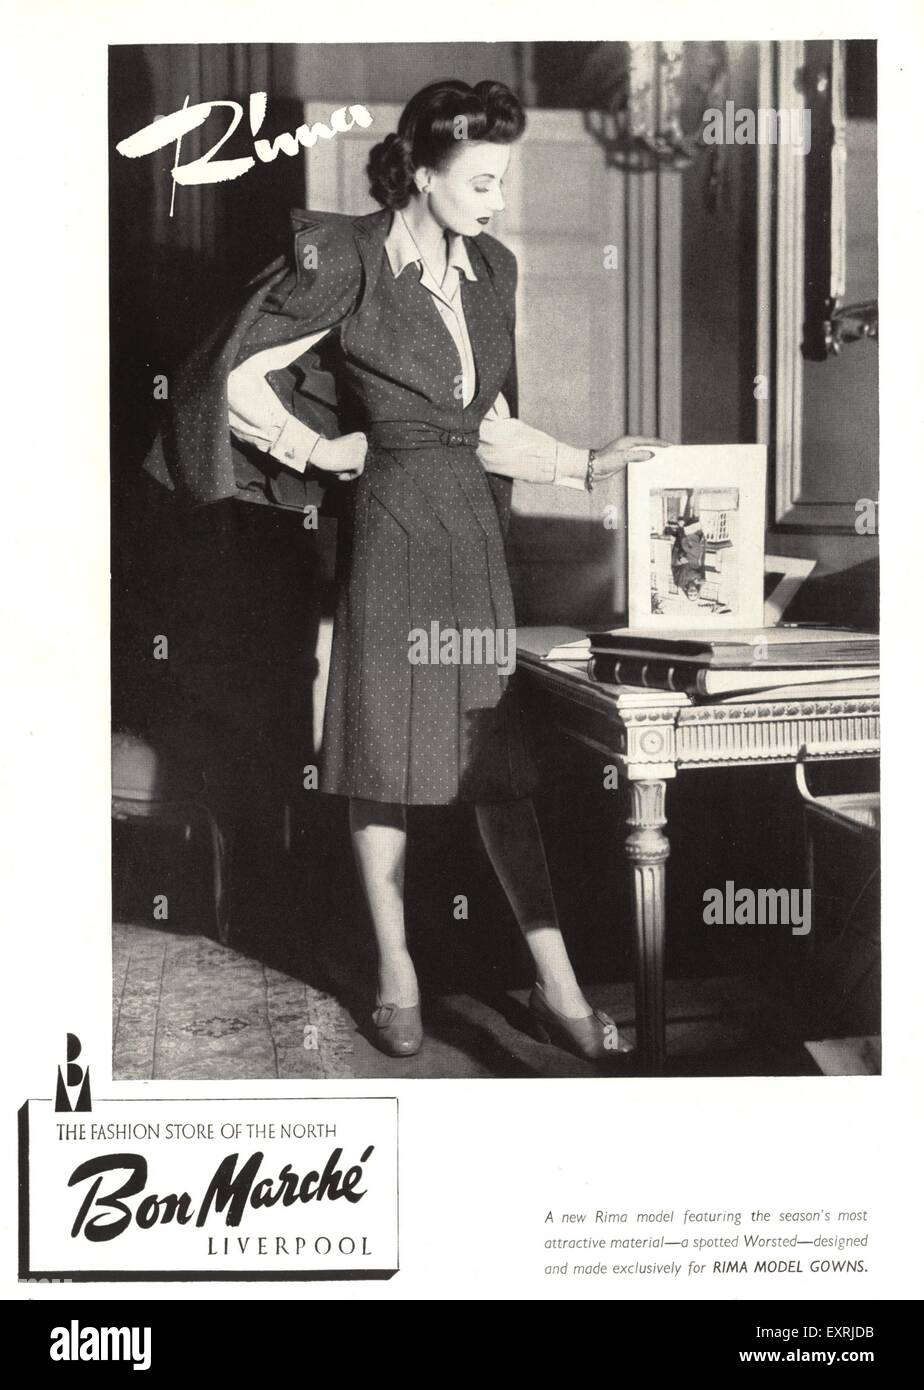 1940s UK Bon Marche Magazine Advert - Stock Image